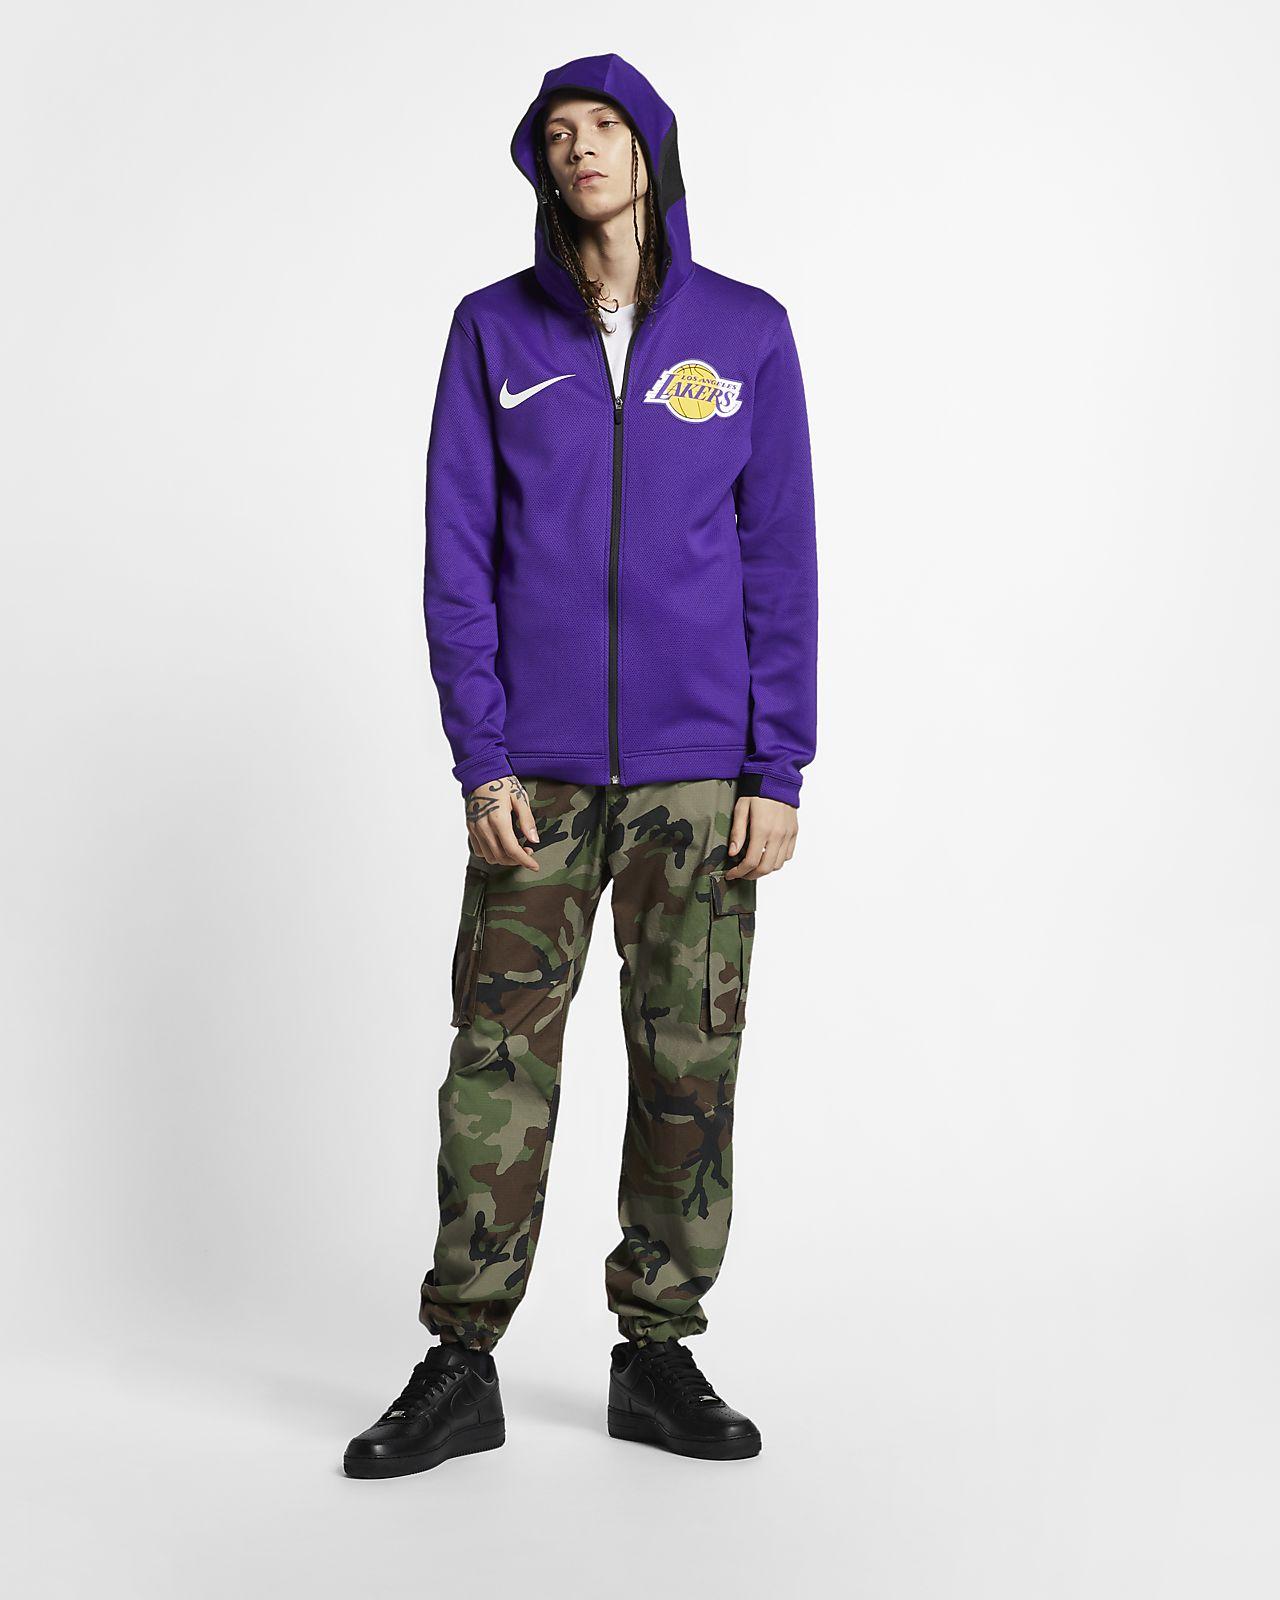 fc1f85c9331c Los Angeles Lakers Nike Therma Flex Showtime Men s NBA Hoodie. Nike.com